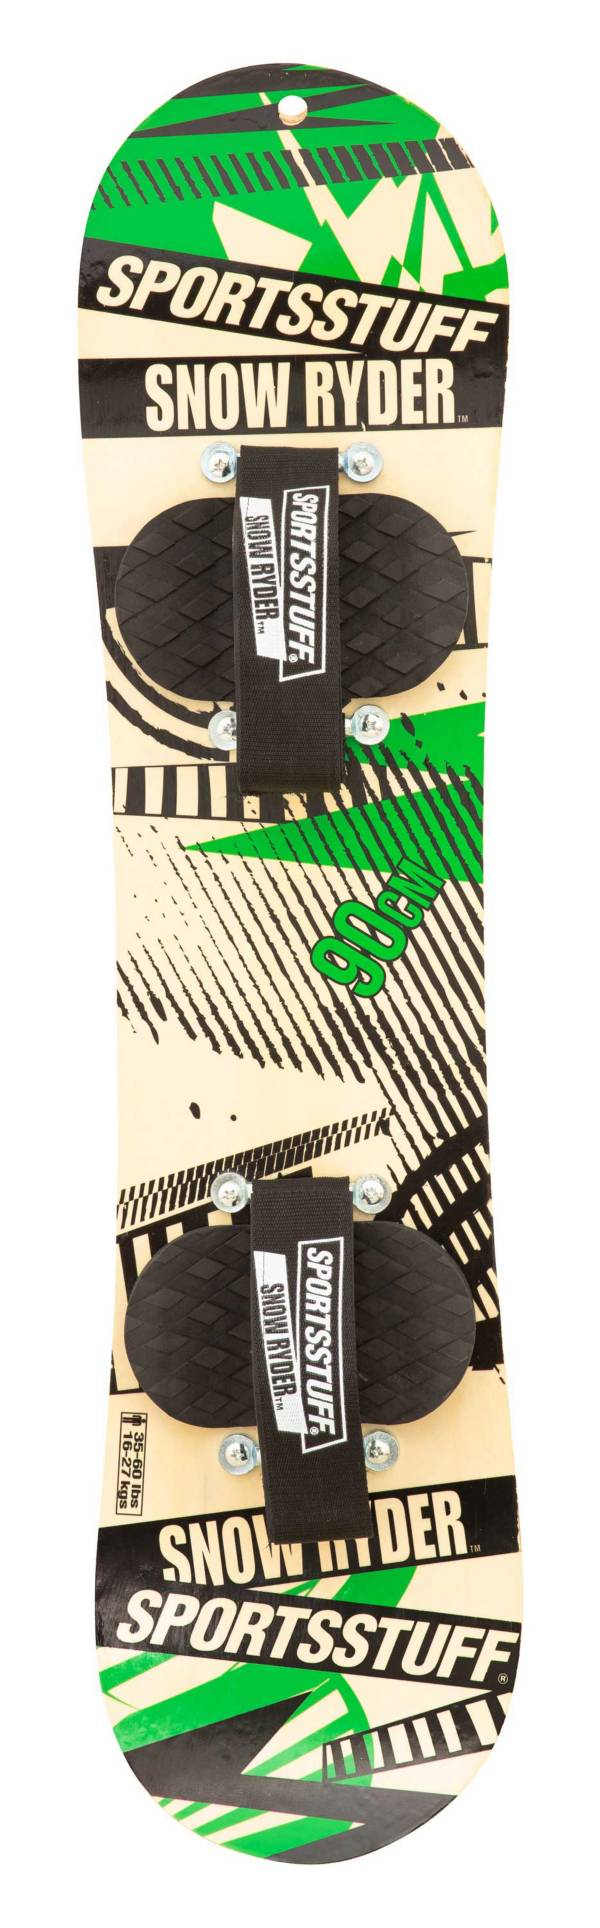 Sportsstuff 90 cm. Snow Ryder product image